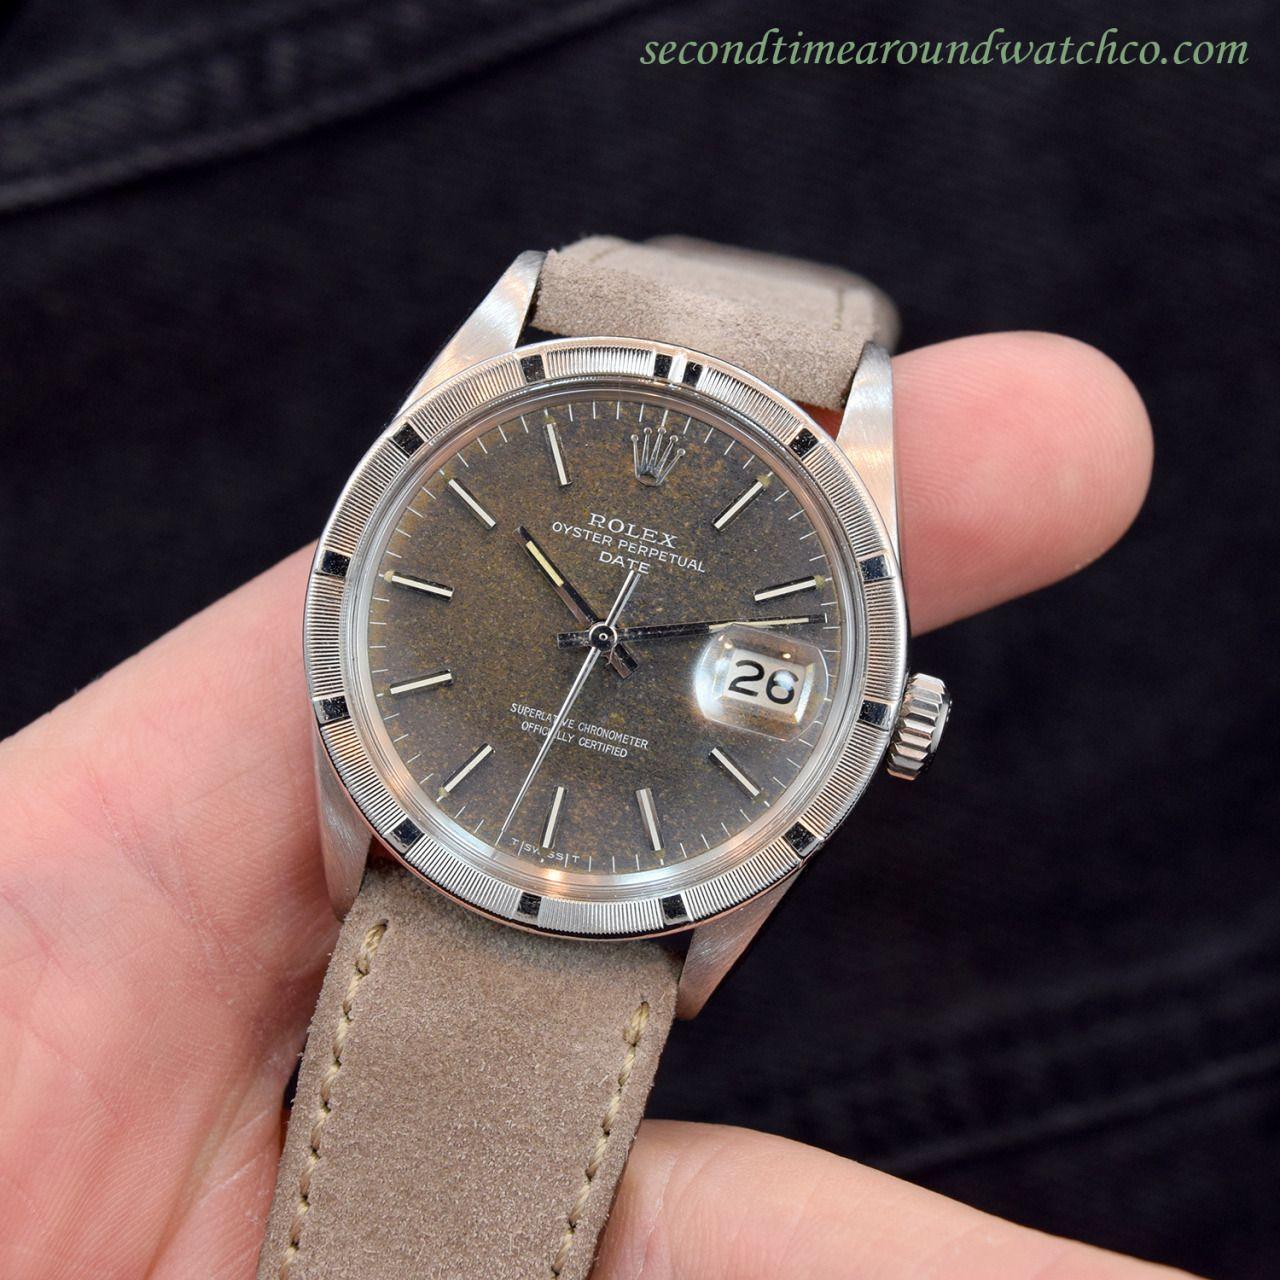 Second Time Around Watch Company Vintage Rolex Vintage Watches Vintage Timepiece